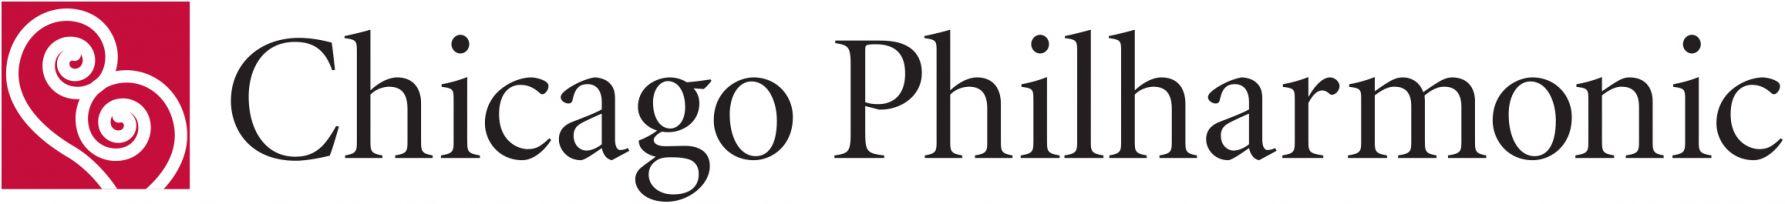 Chicago Philharmonic Orchestra Logo